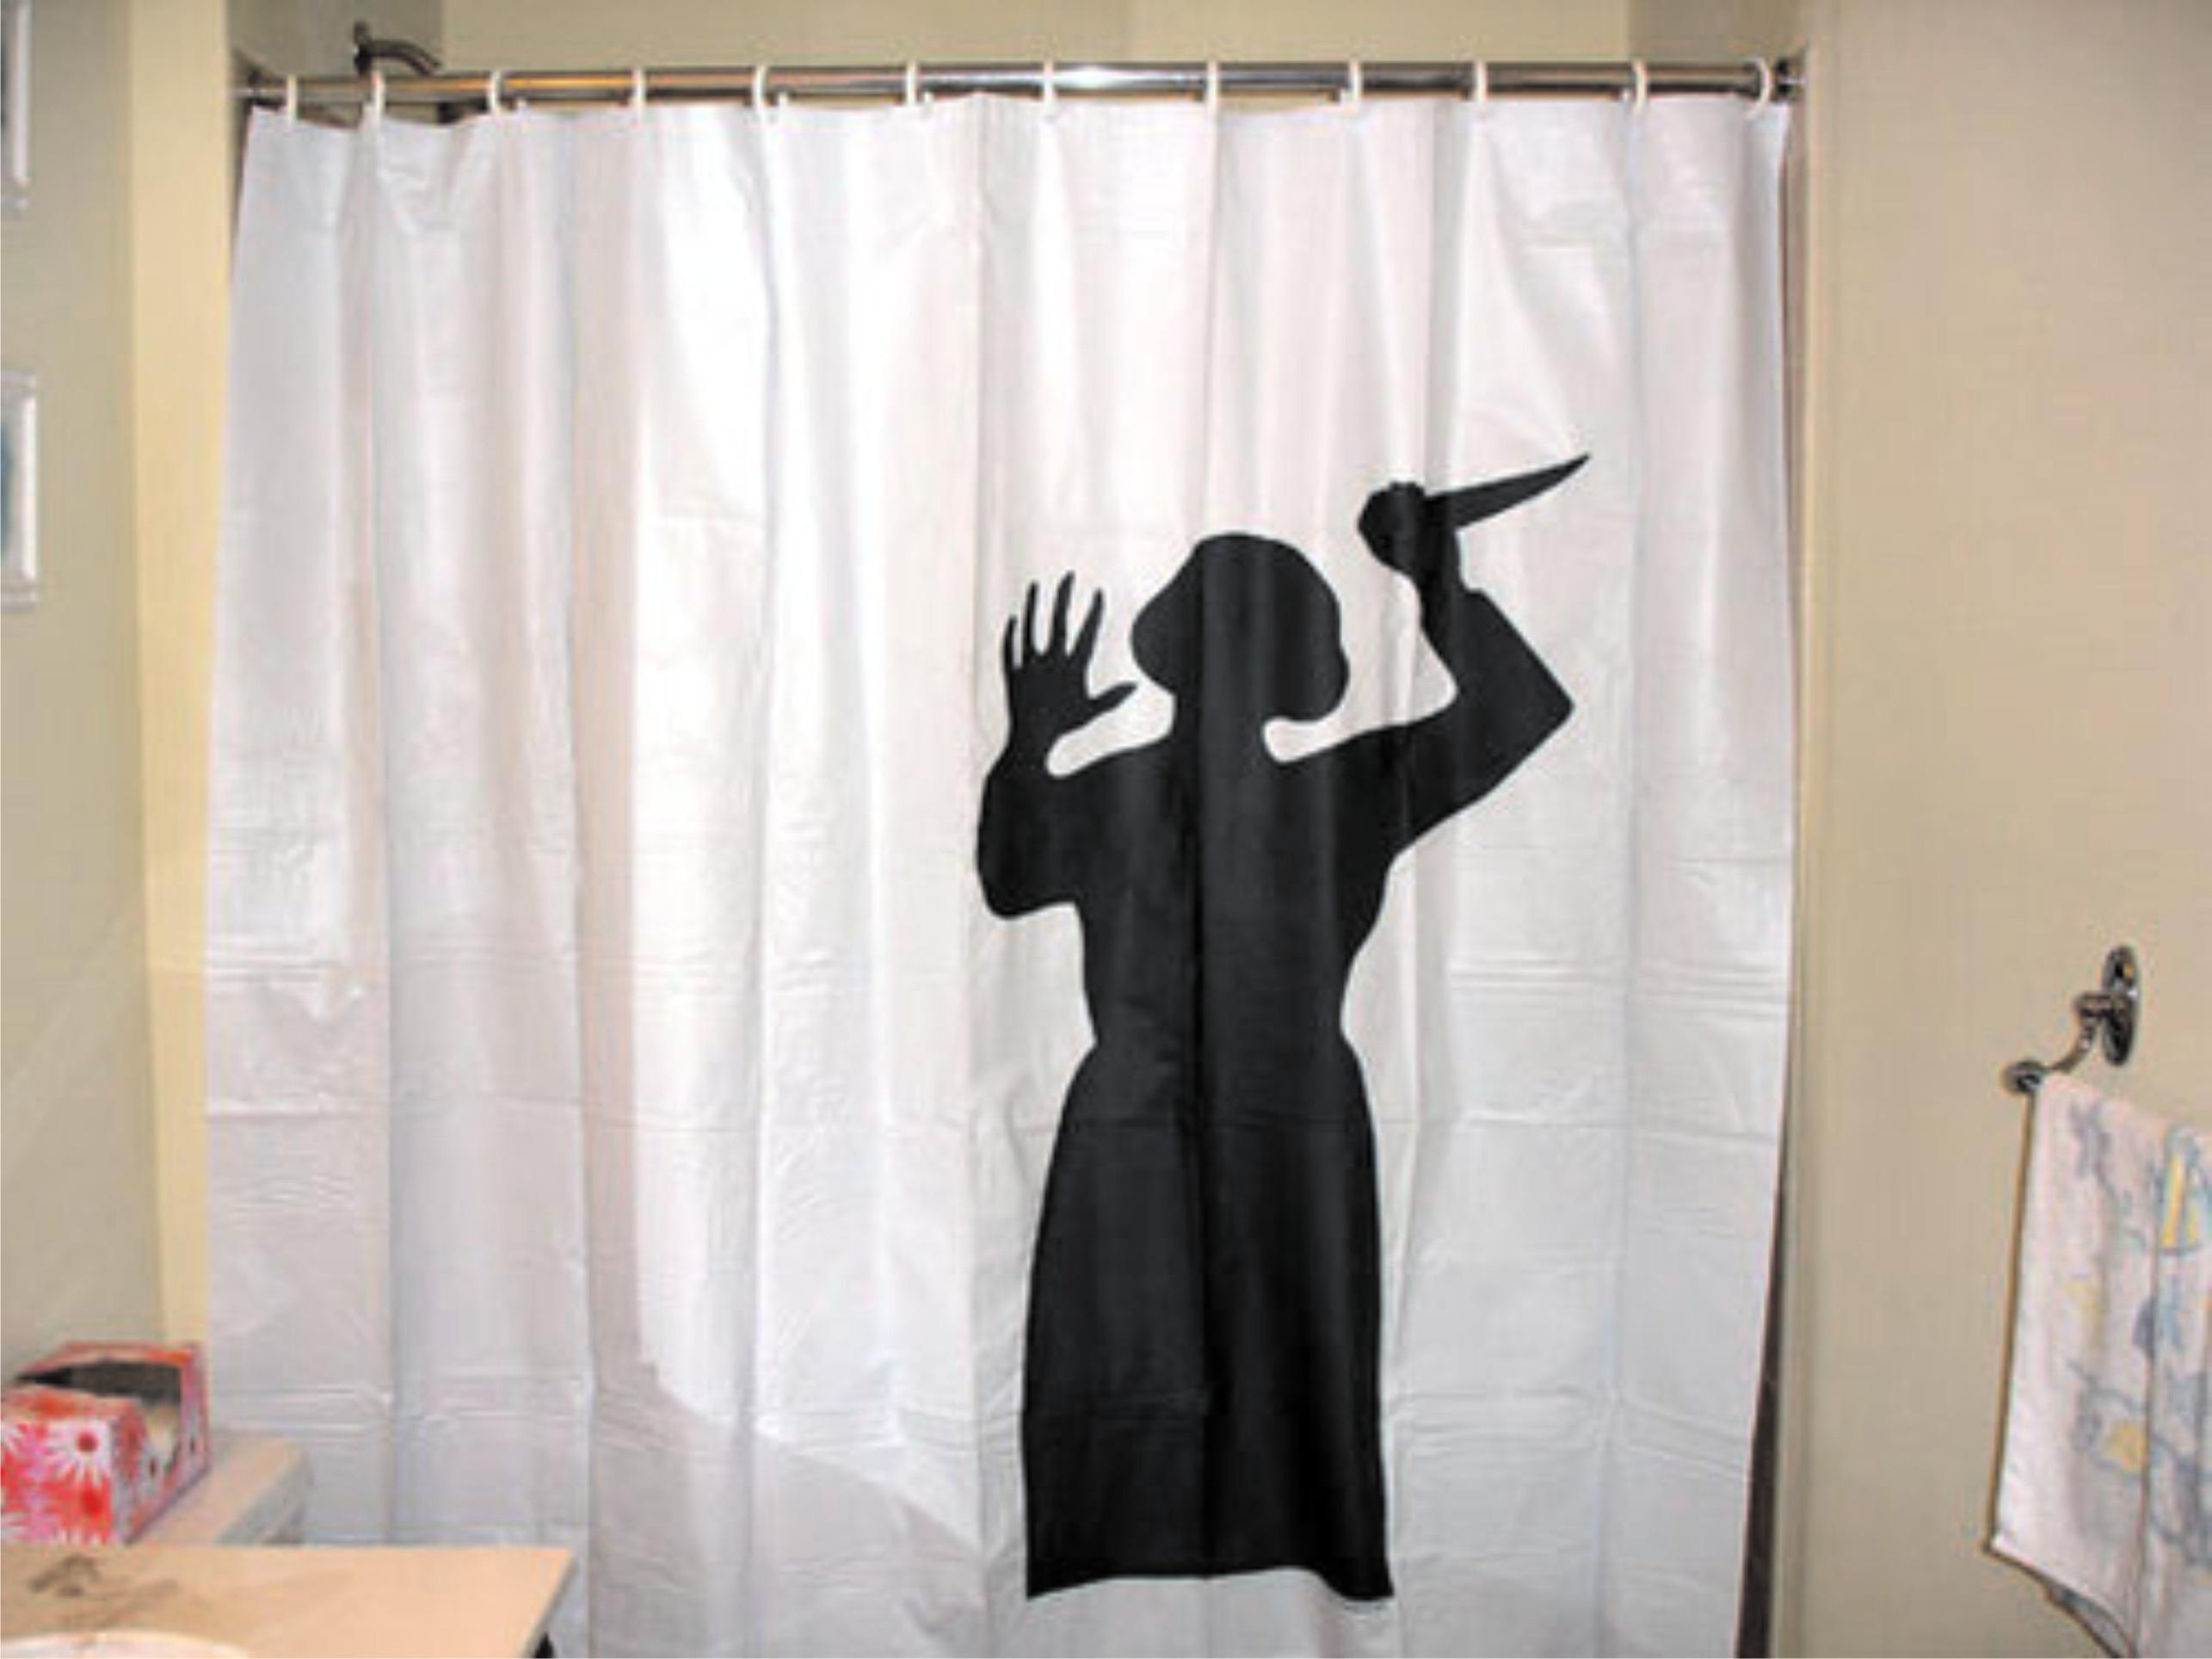 Imagens de #9B4930 box ou cortina psicose adesivo box ou cortina psicose adesivo box  2571x1928 px 3062 Box Banheiro Blumenau